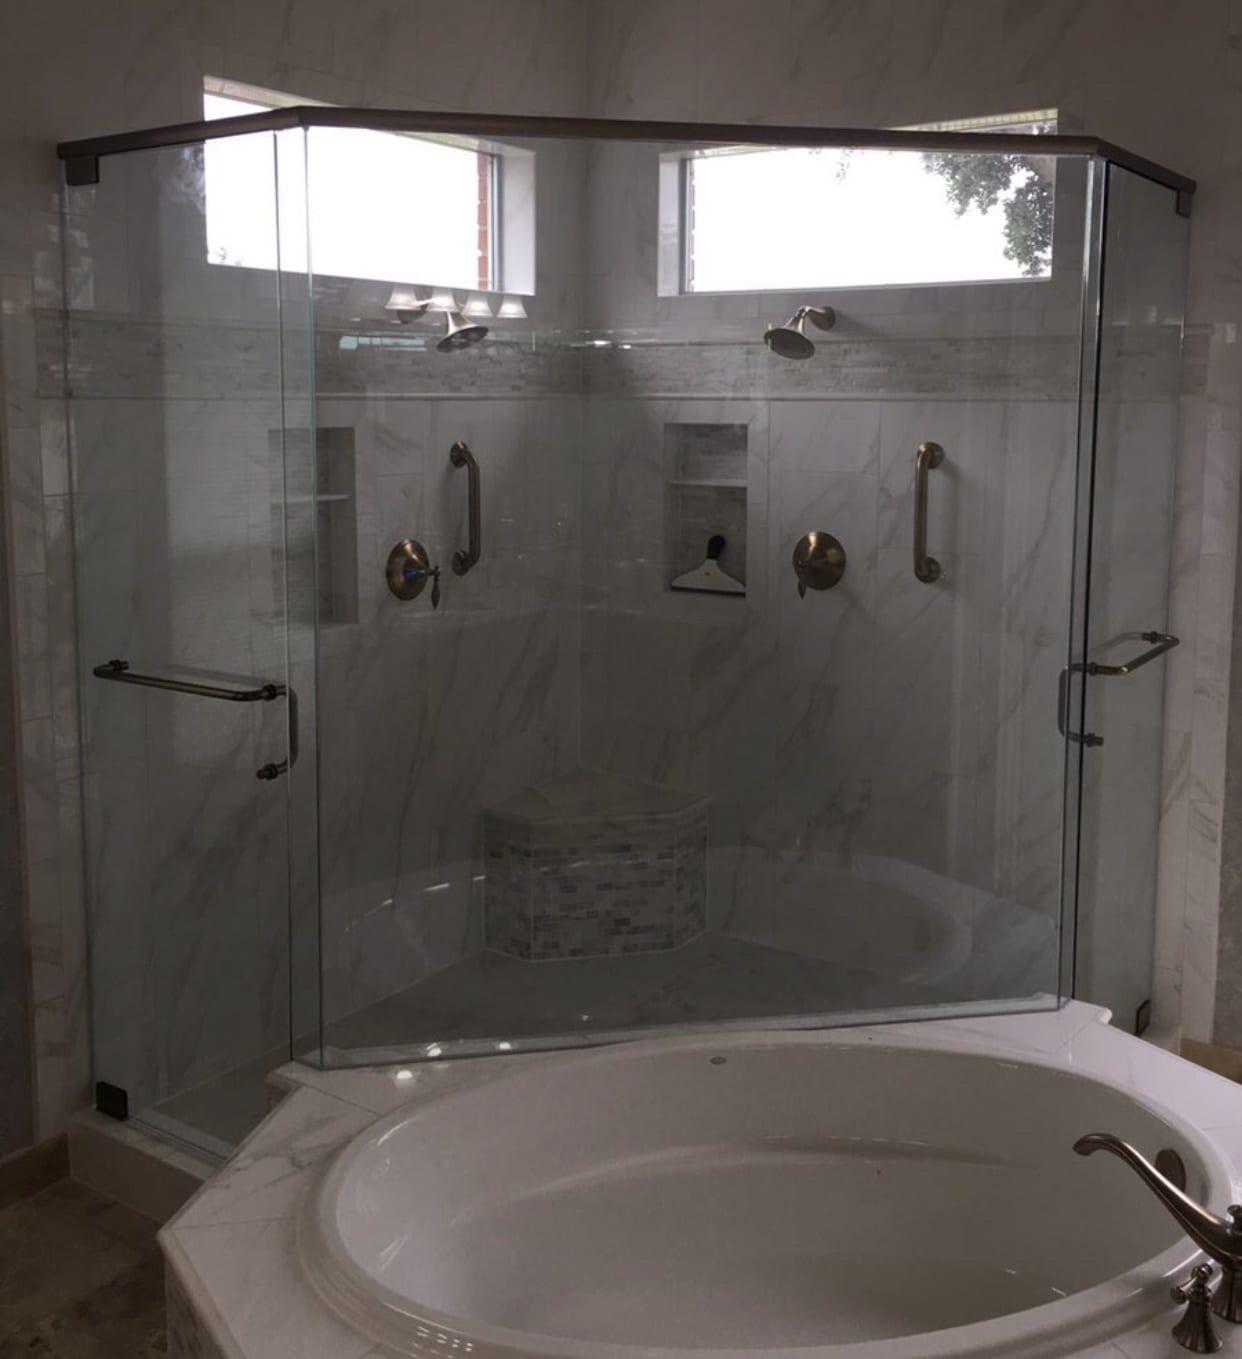 frameless shower doors img 2163 custom bathroom mirrors and decorative glass from Shower Doors of Nashville